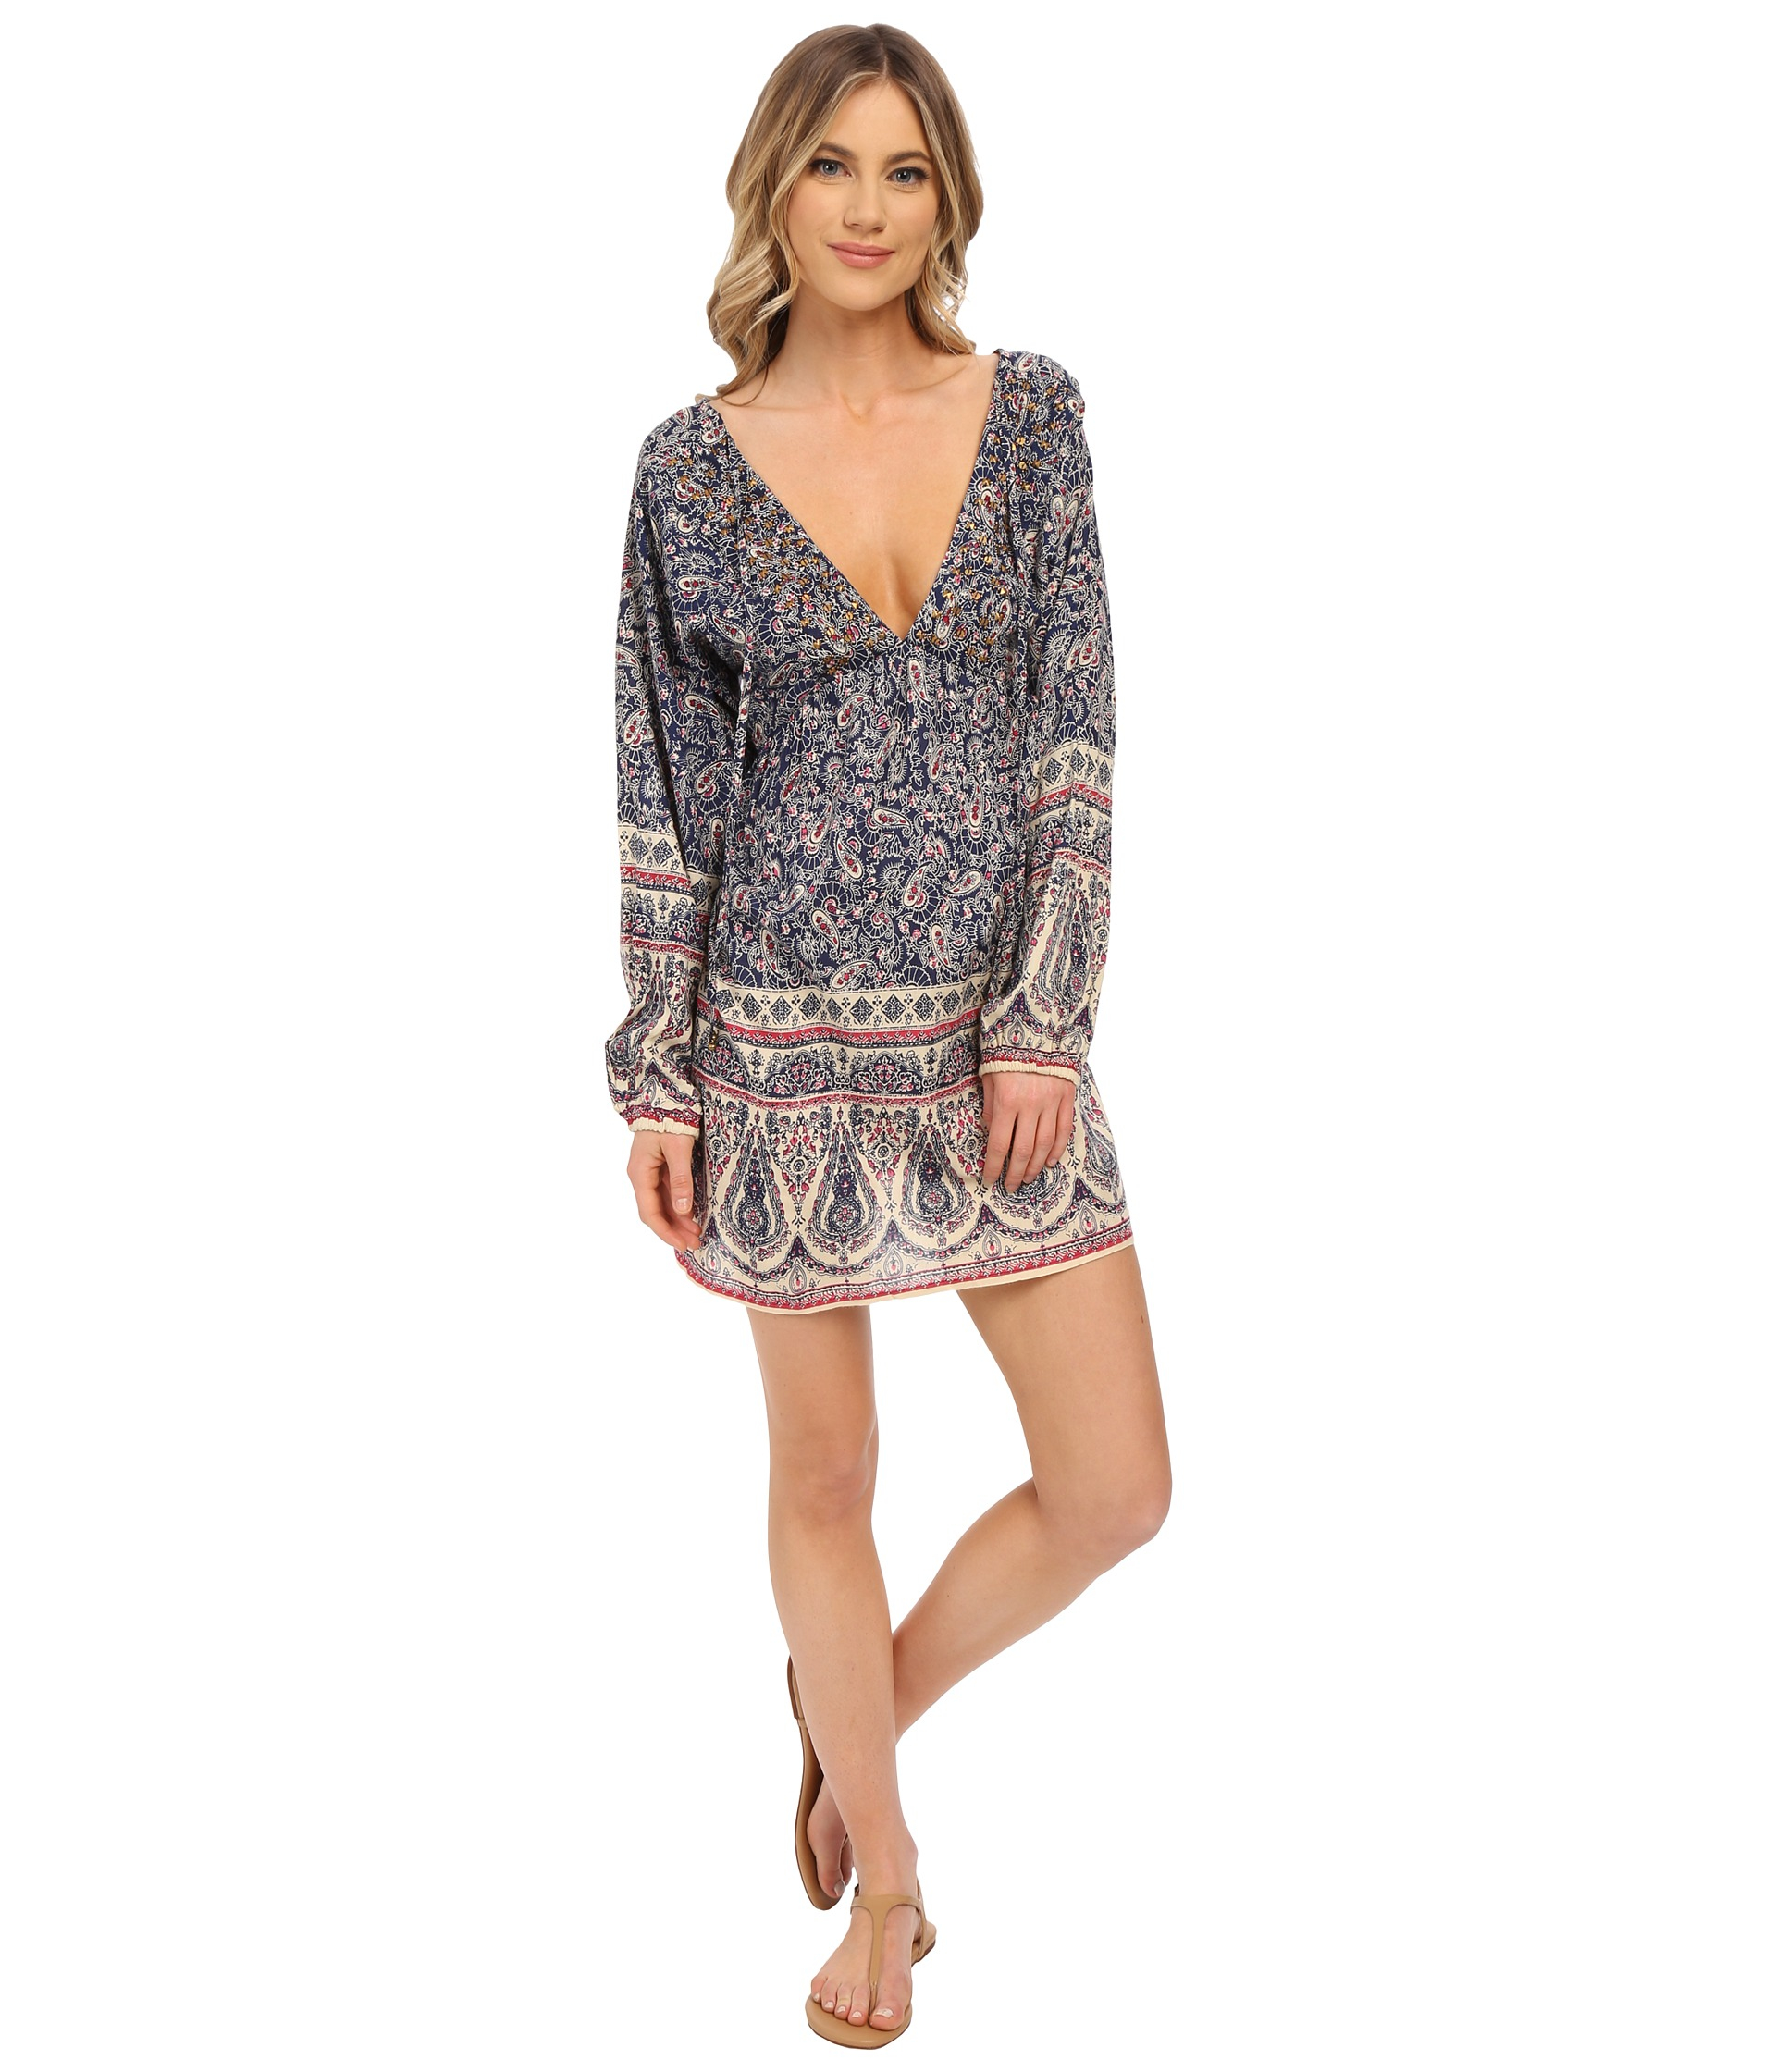 Brigitte bailey Sadie Long Sleeve Dress With Open Back in Gray - Lyst